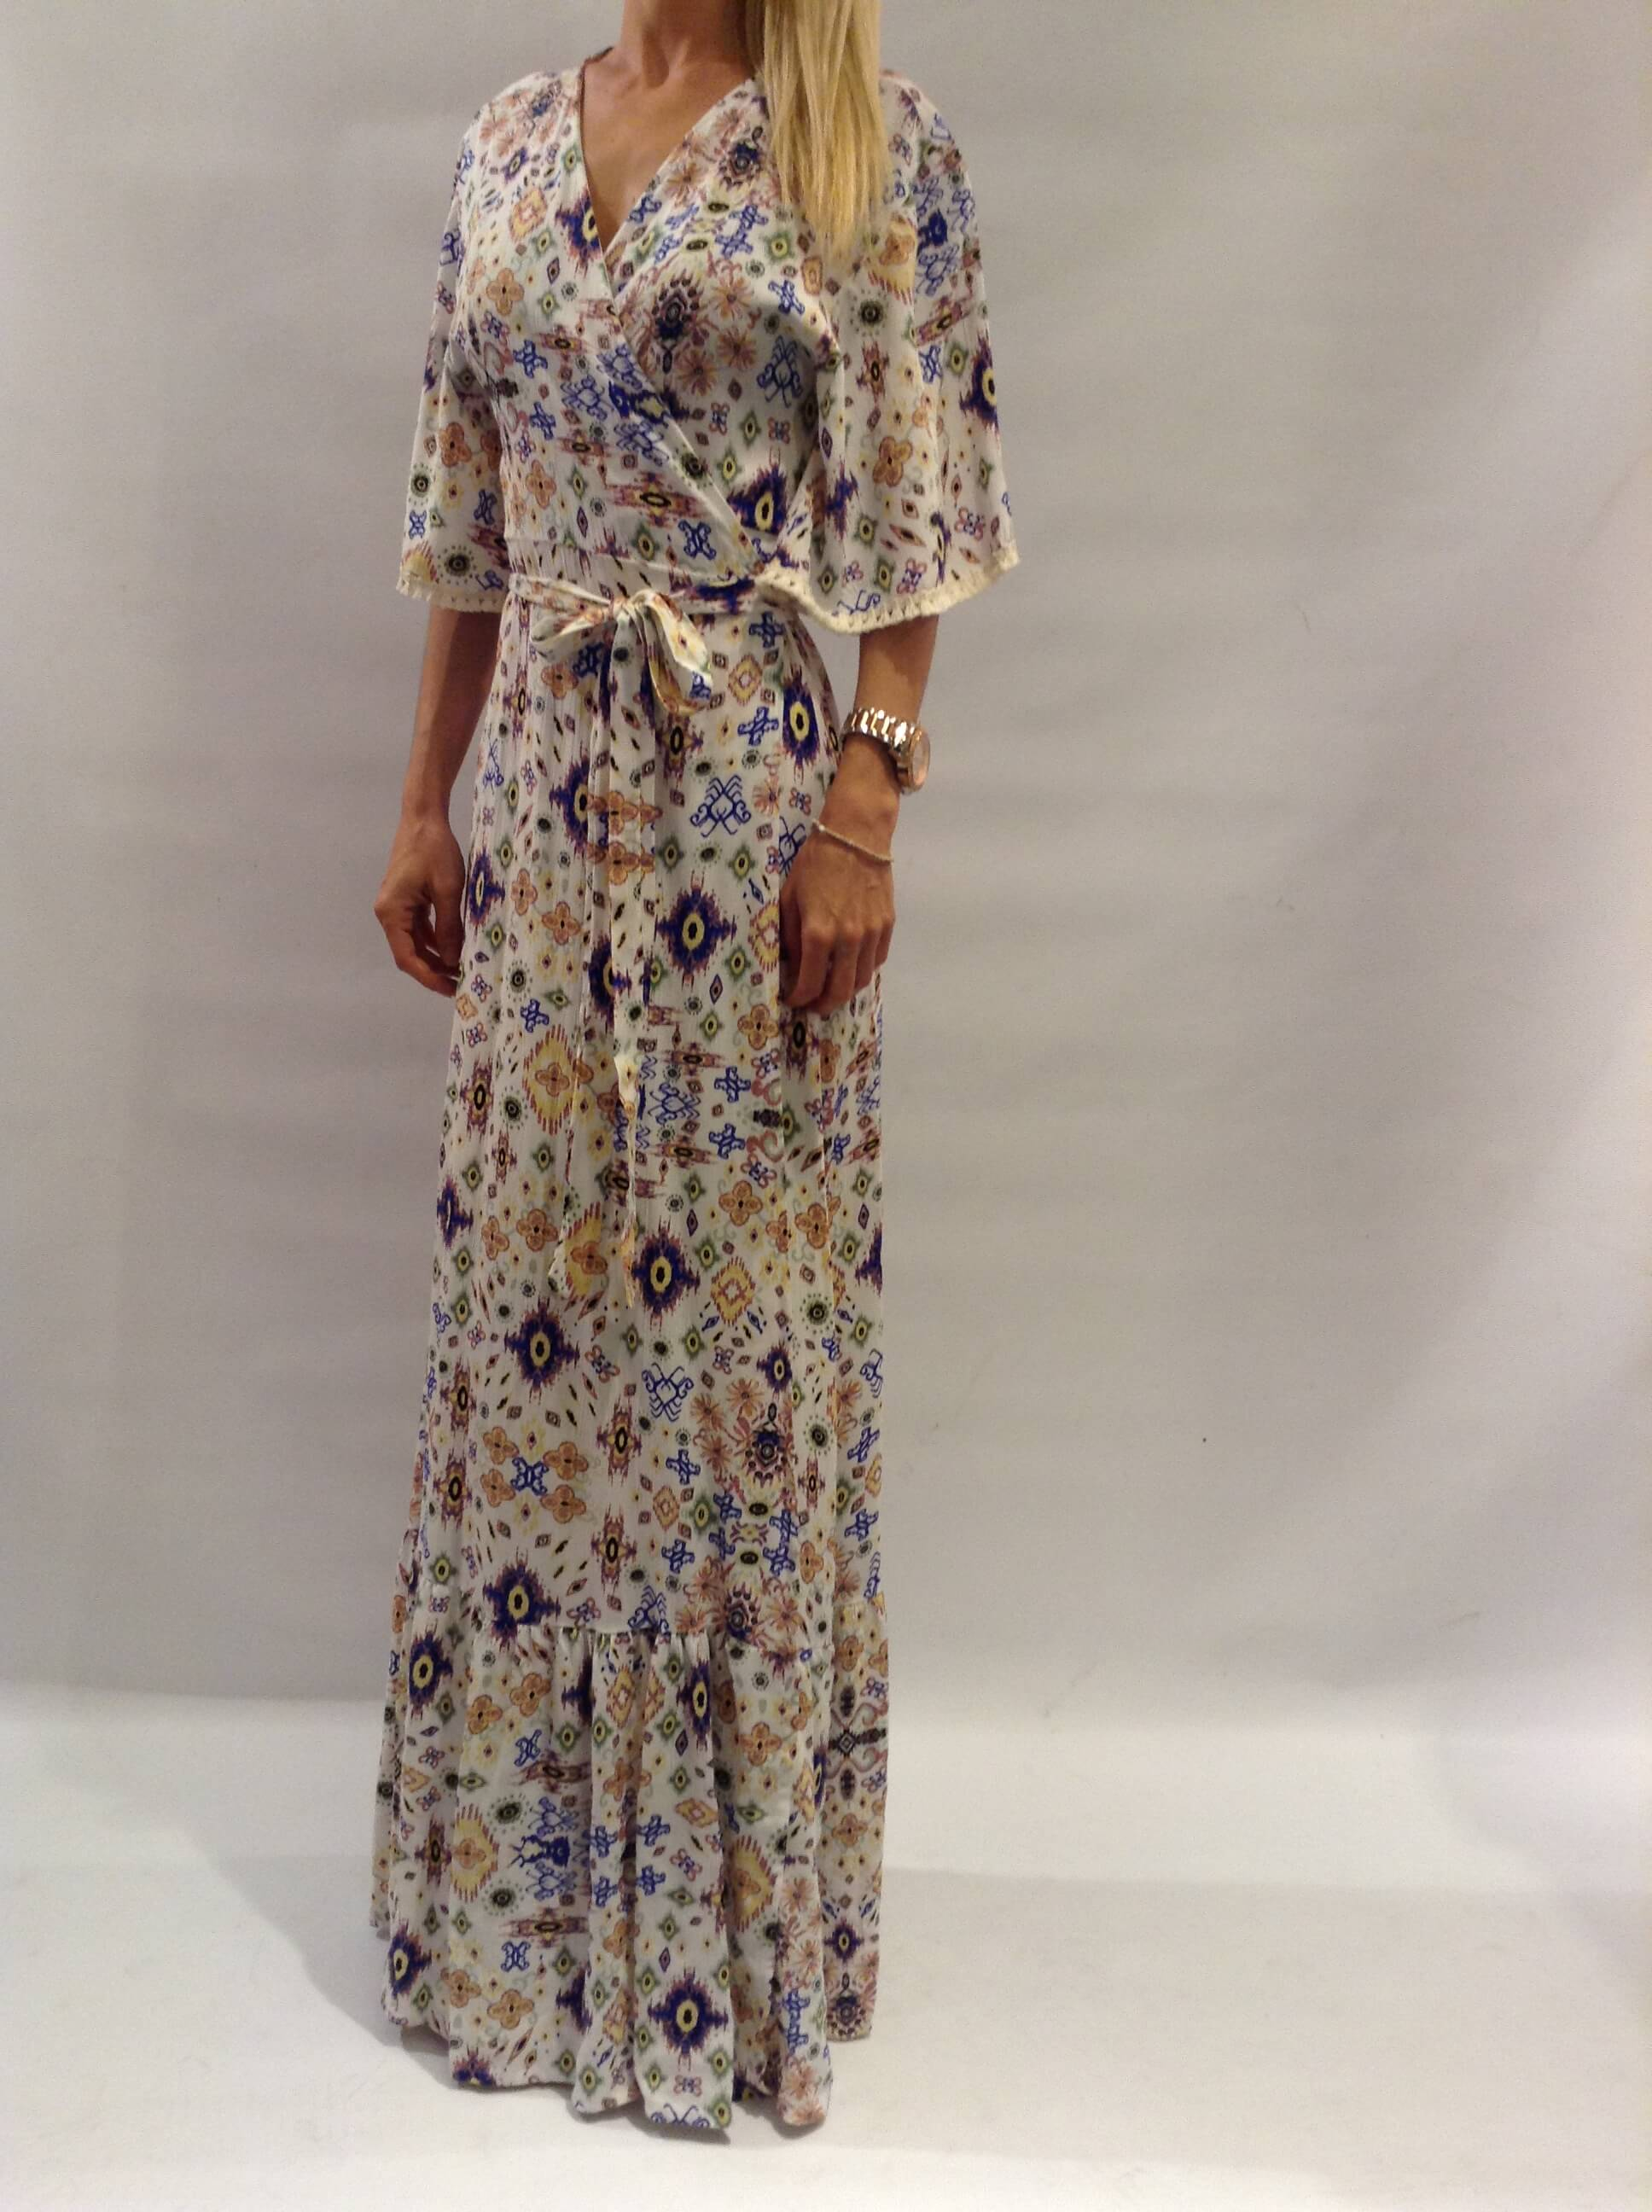 b50b435c4914 Φόρεμα maxi εμπριμέ κρουαζέ με βολάν